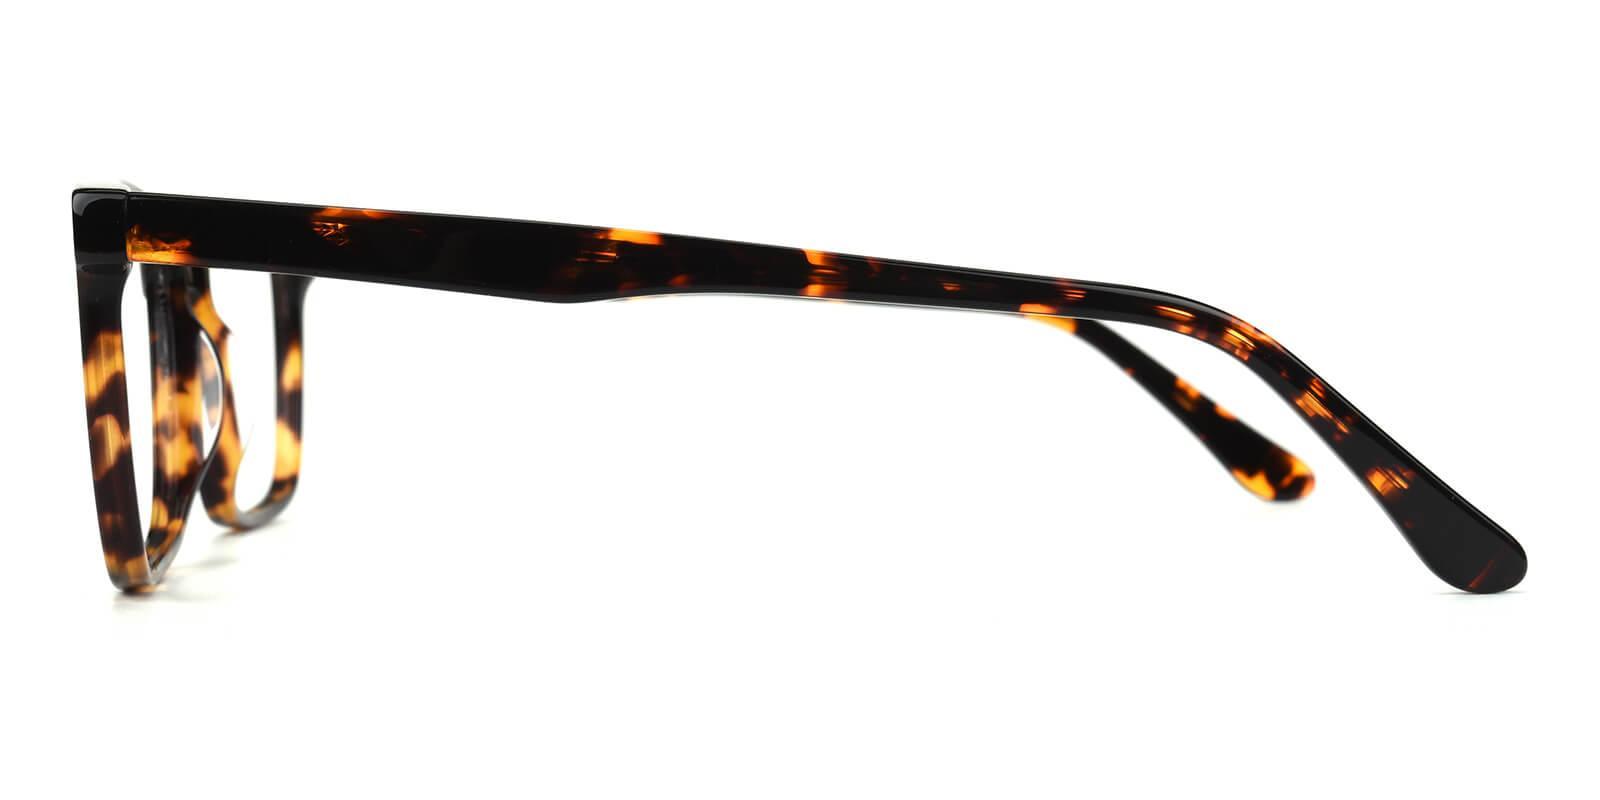 Sakou-Tortoise-Square-Acetate-Eyeglasses-additional3